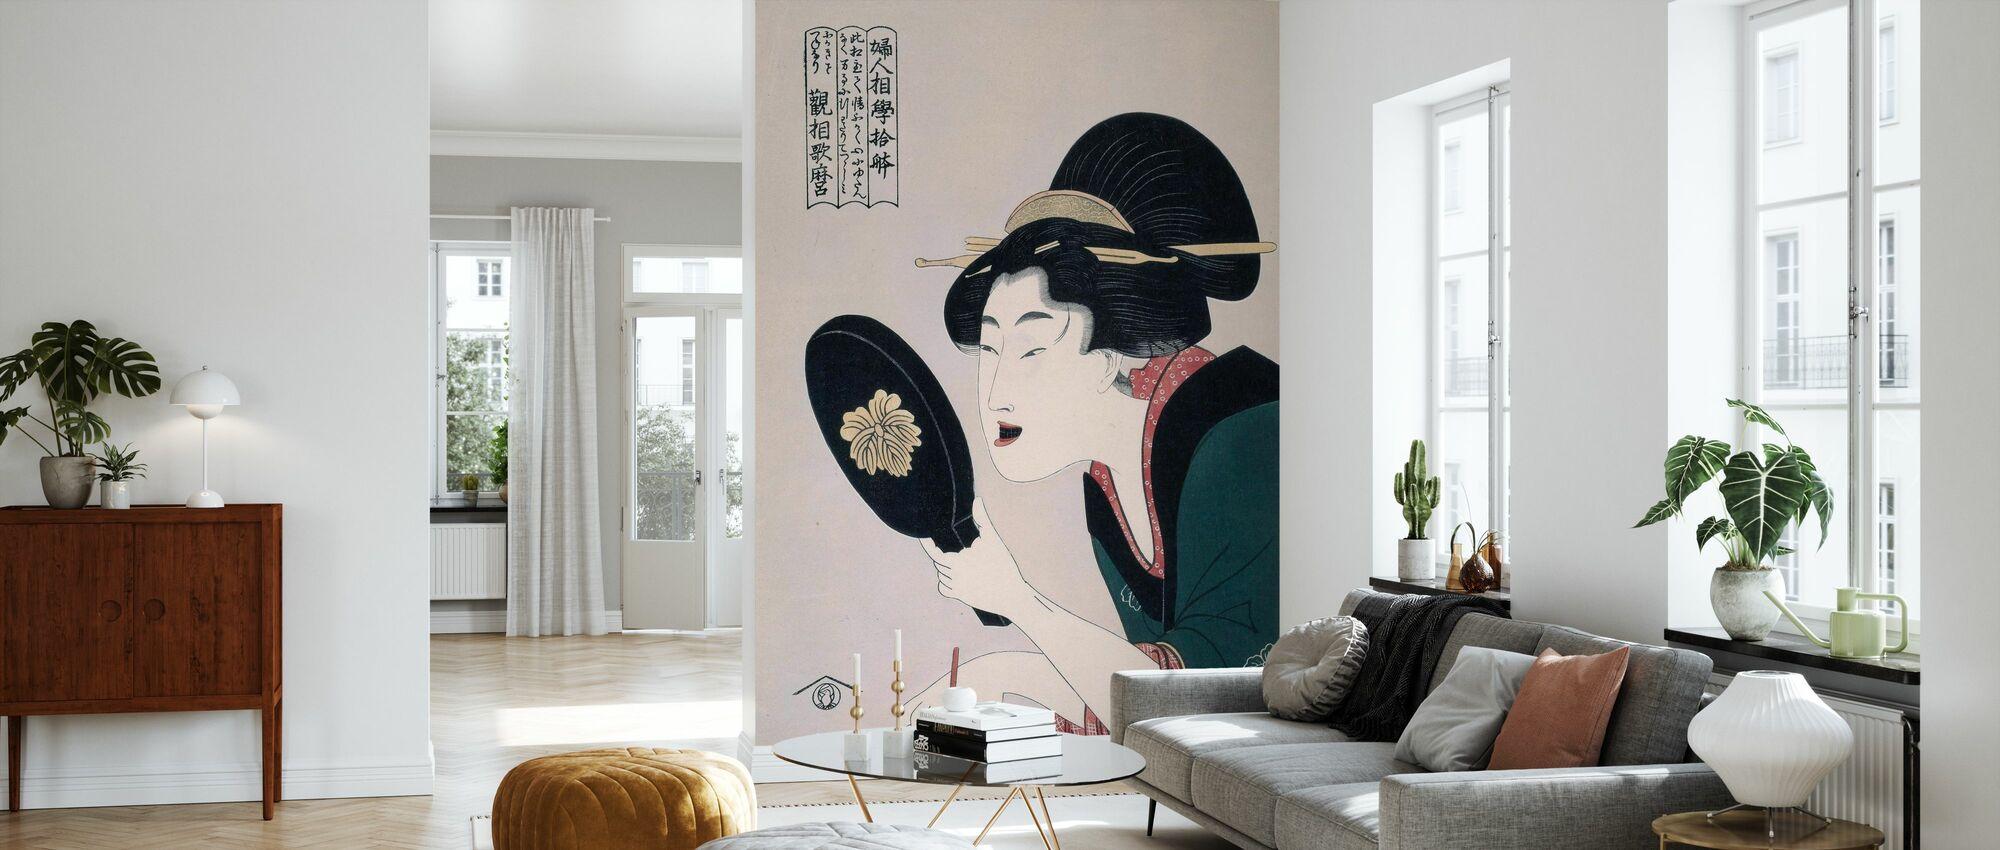 Tsuruya Kiemon - Kitagawa Utamaro - Wallpaper - Living Room